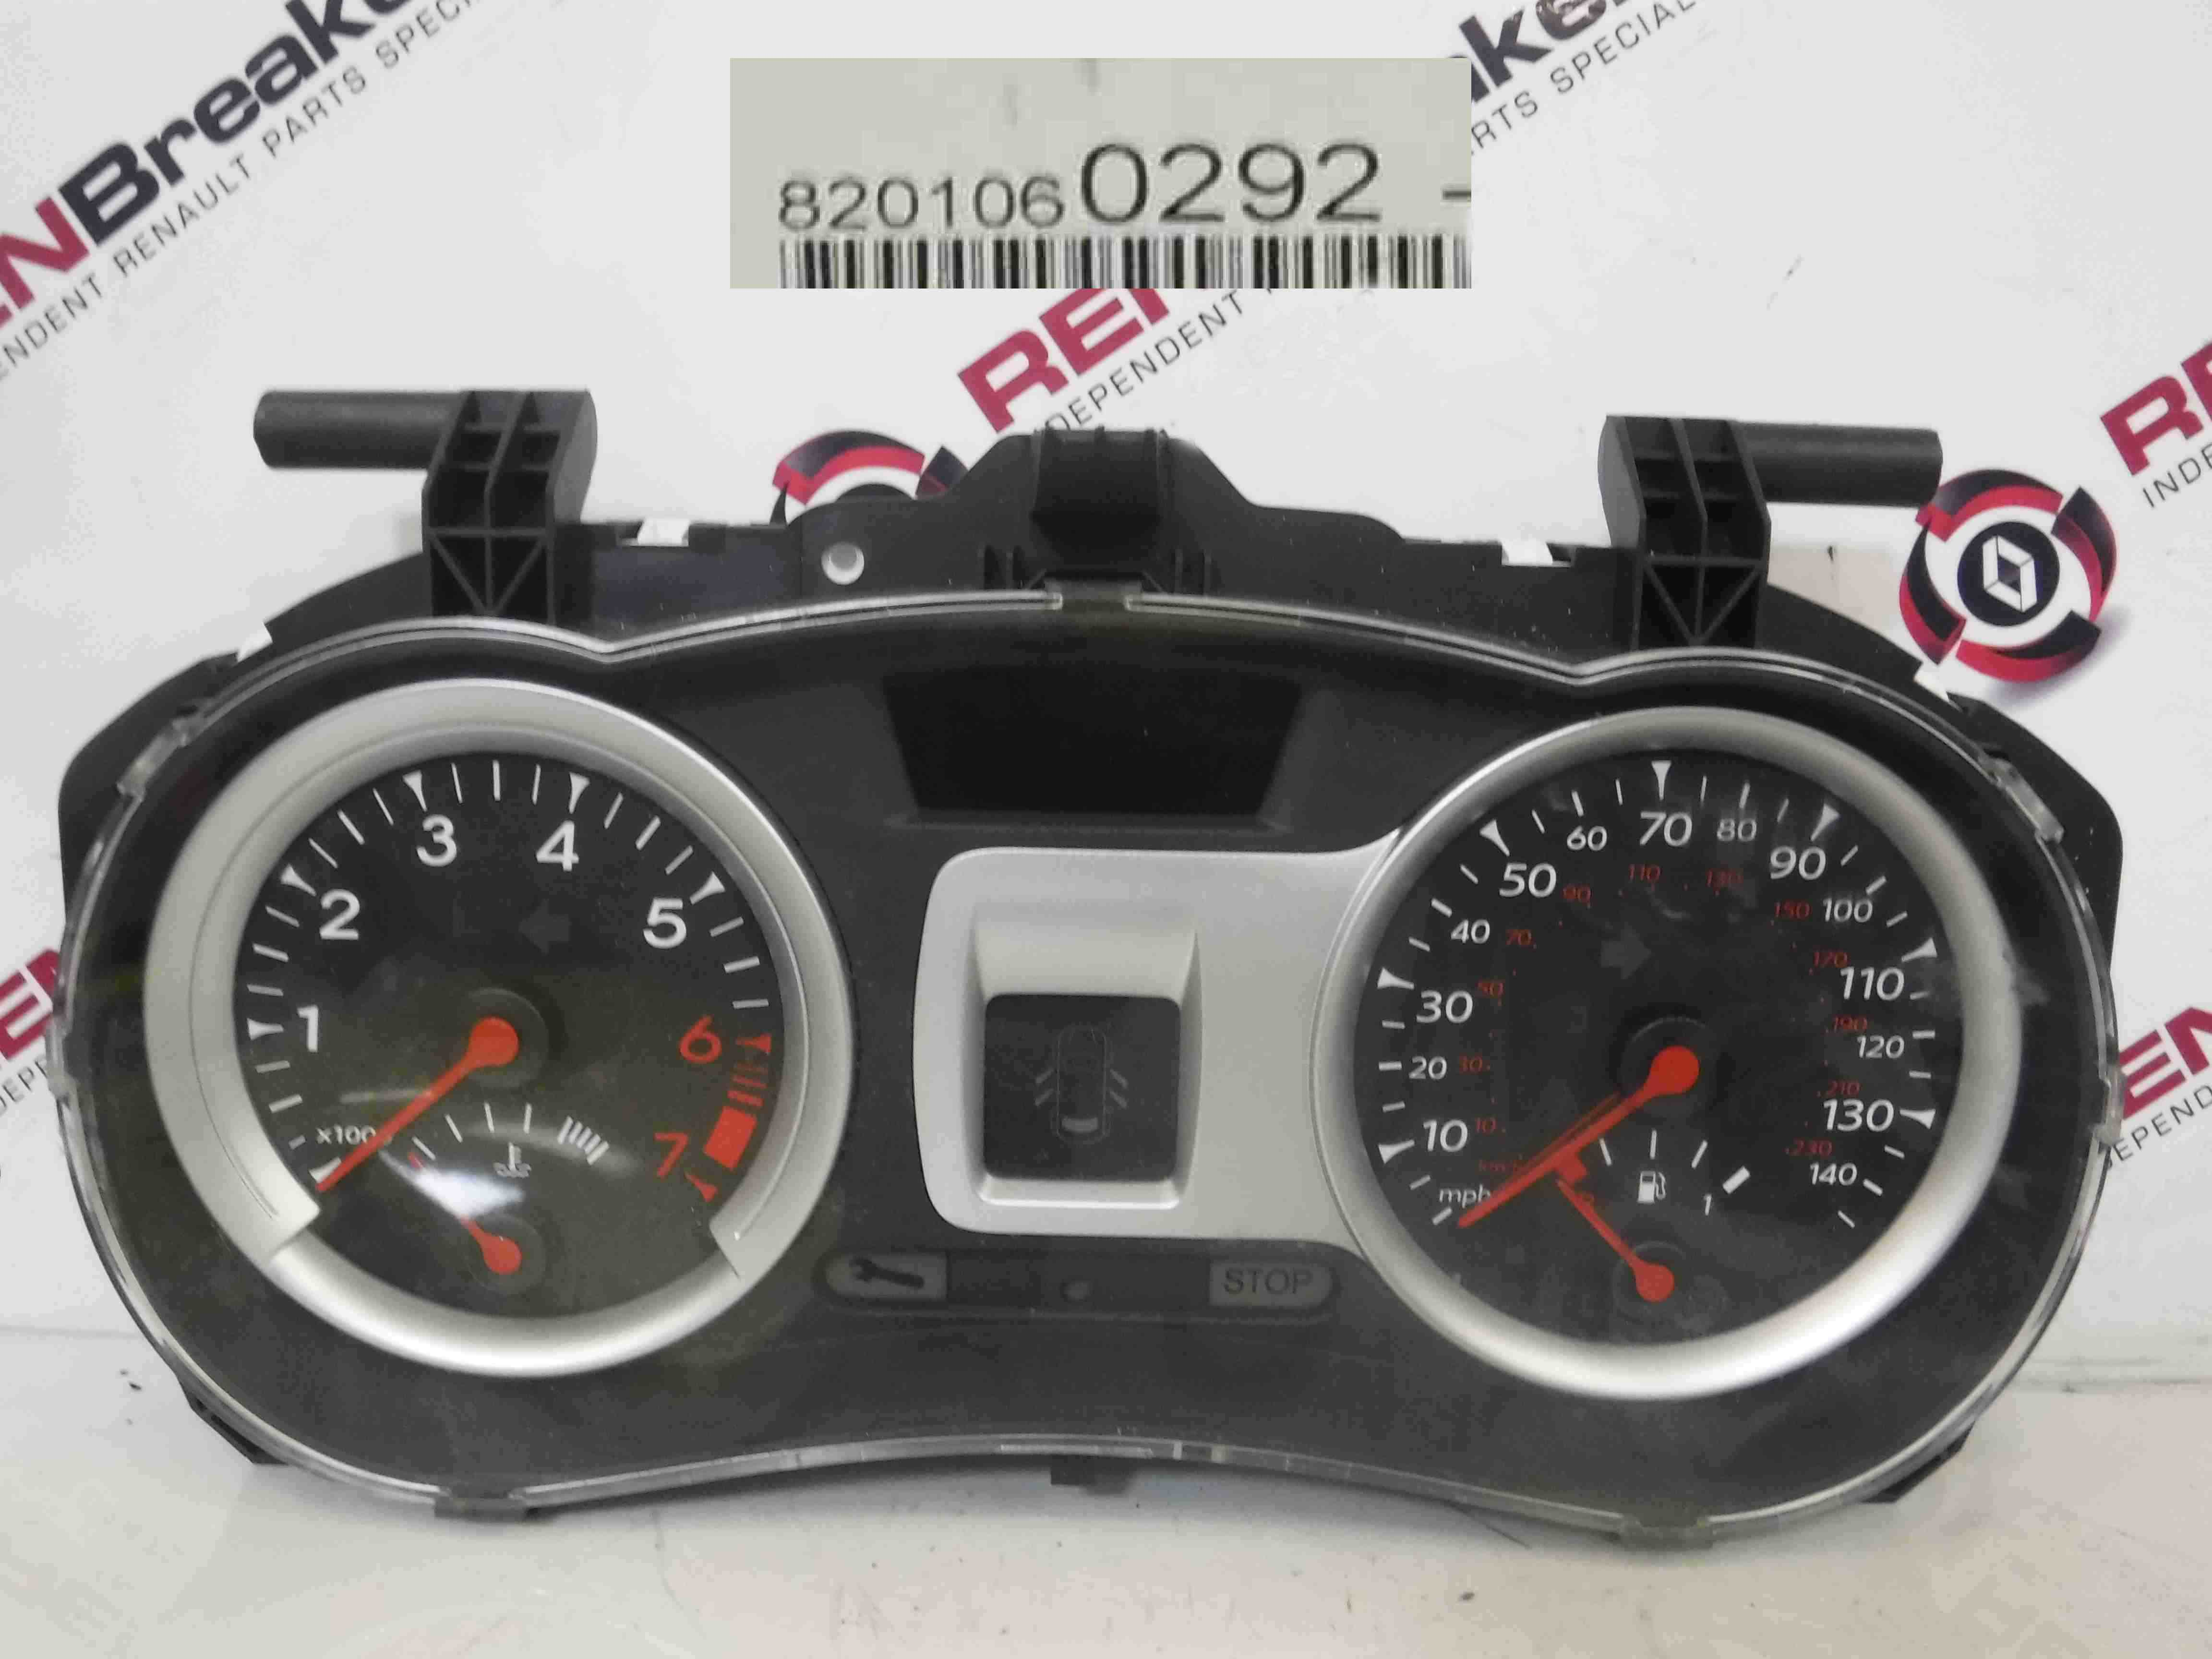 Renault Clio MK3 2005-2012 Instrument Panel Dials Gauges Clocks 100K 8201060292